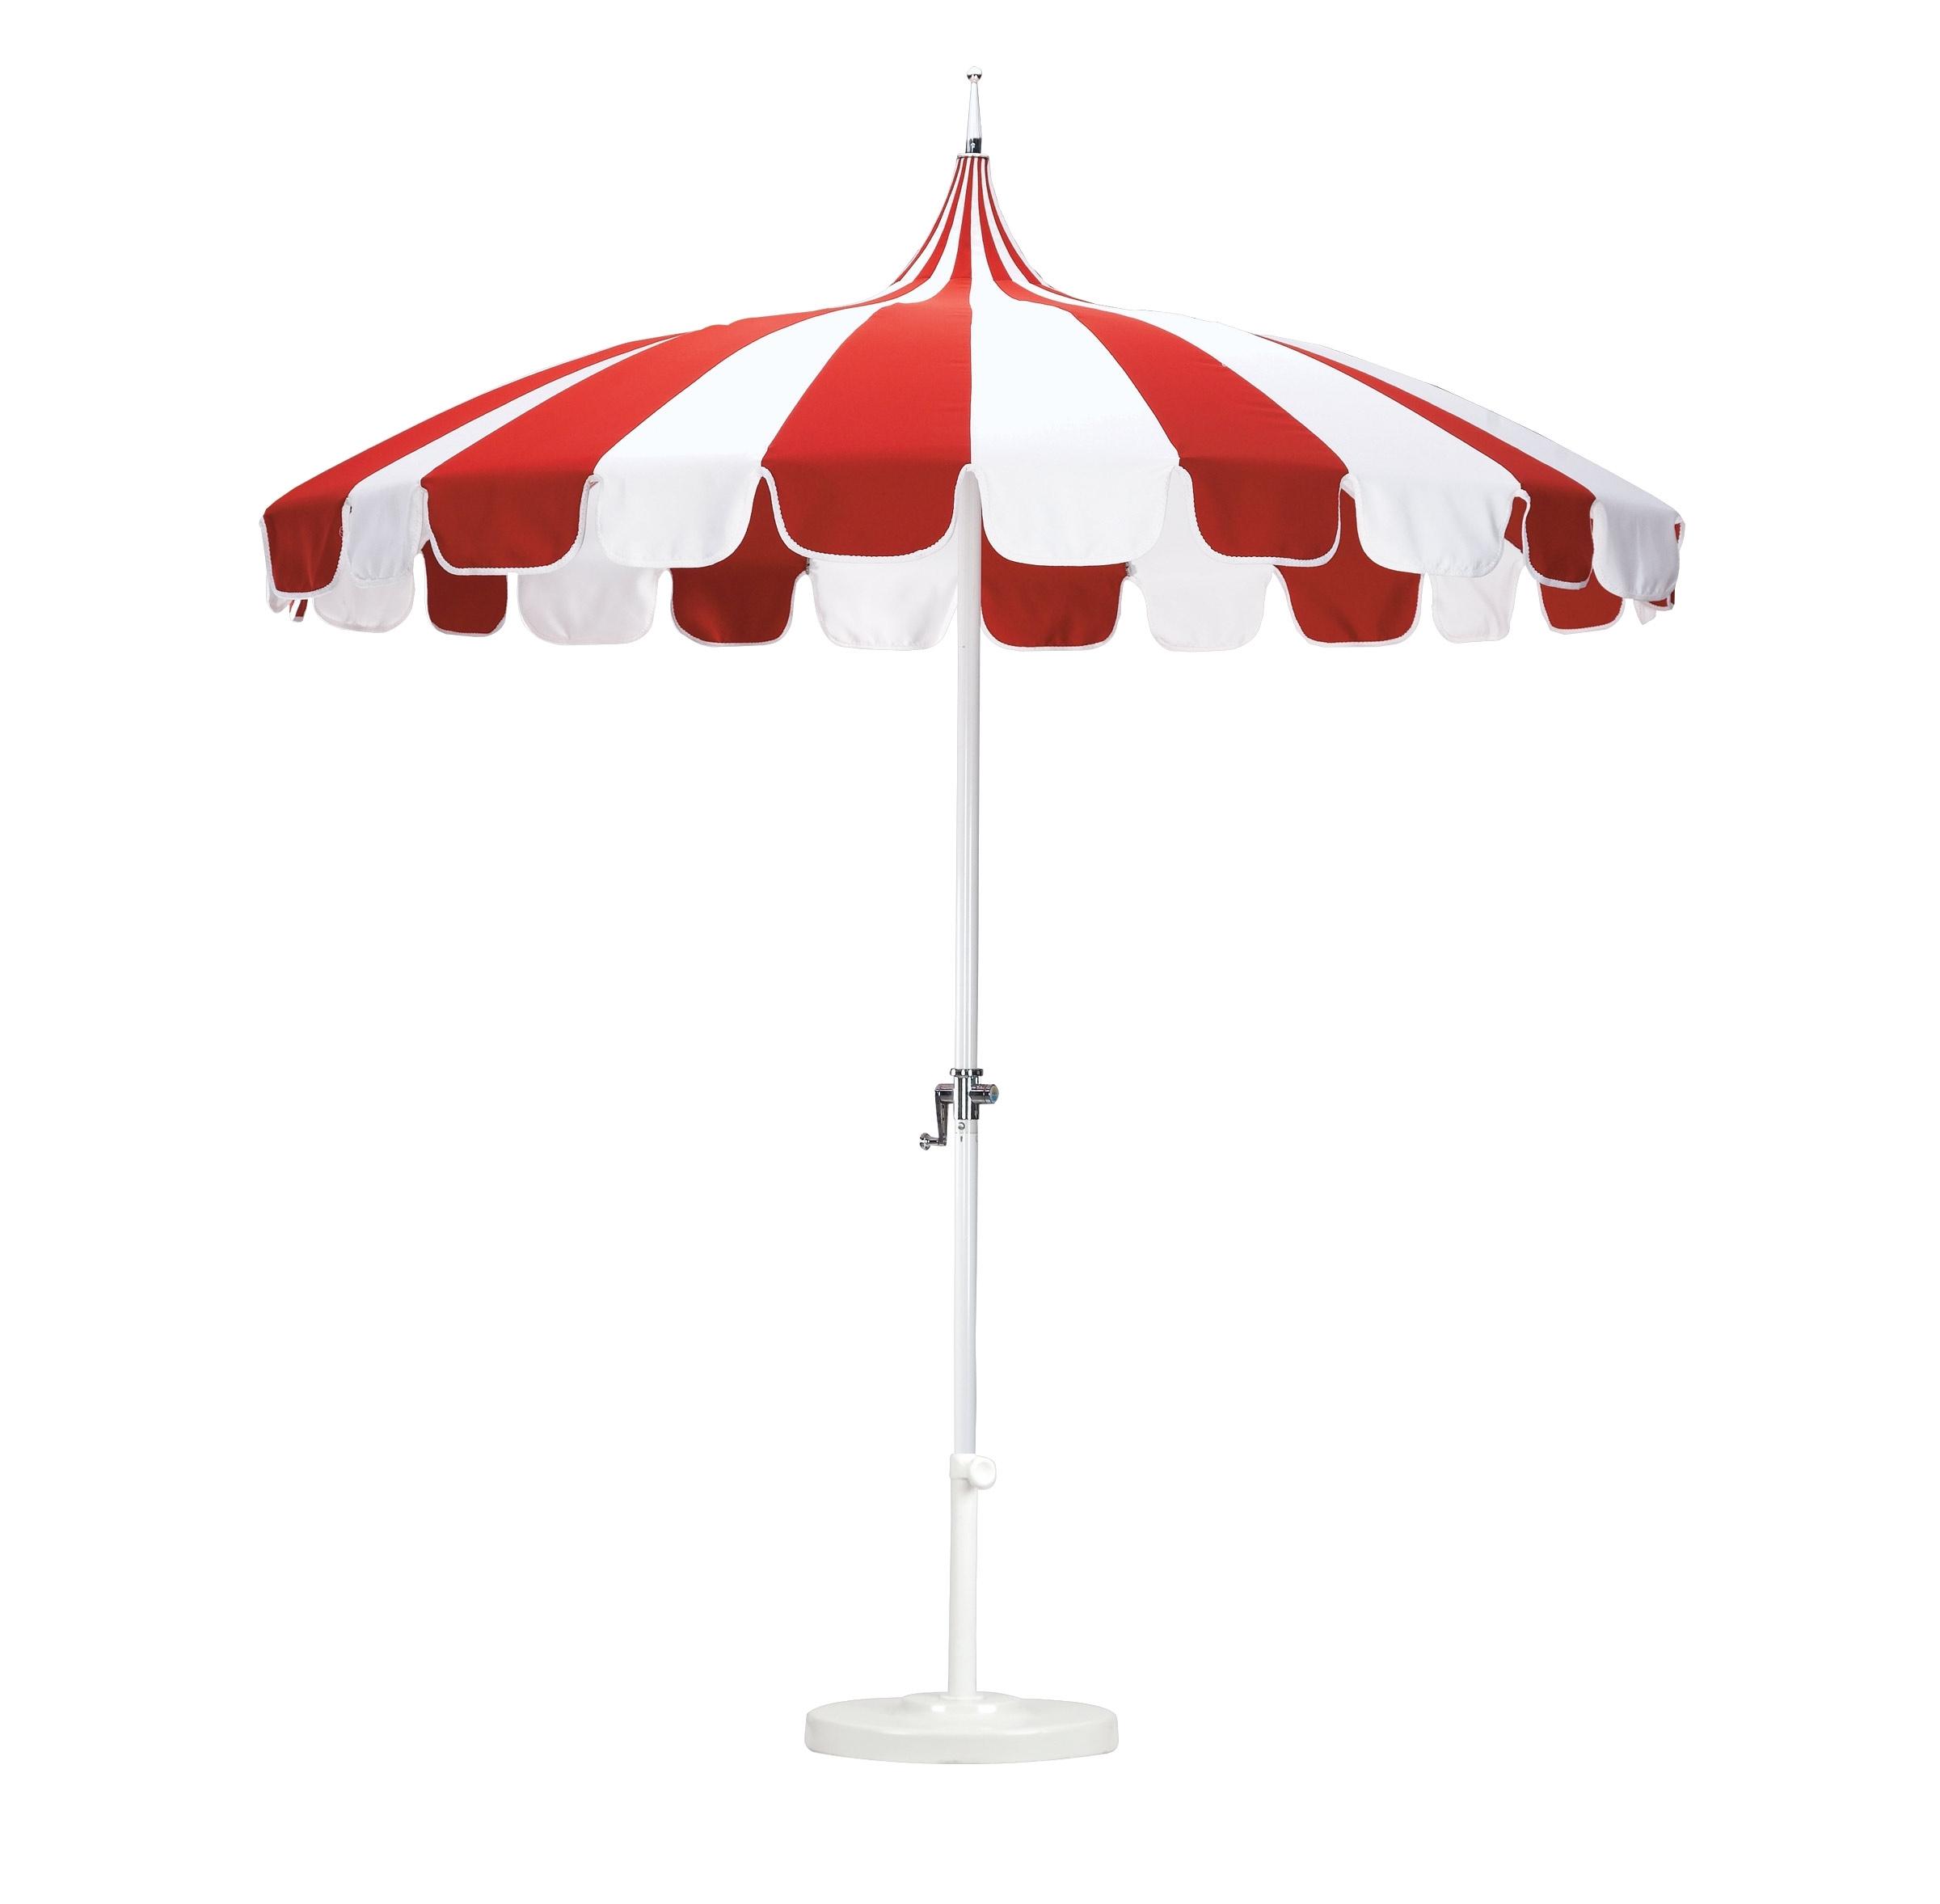 Fiberglass Patio Umbrella Luxury Patio Umbrella Store Resort With Regard To Best And Newest Deluxe Patio Umbrellas (View 12 of 20)